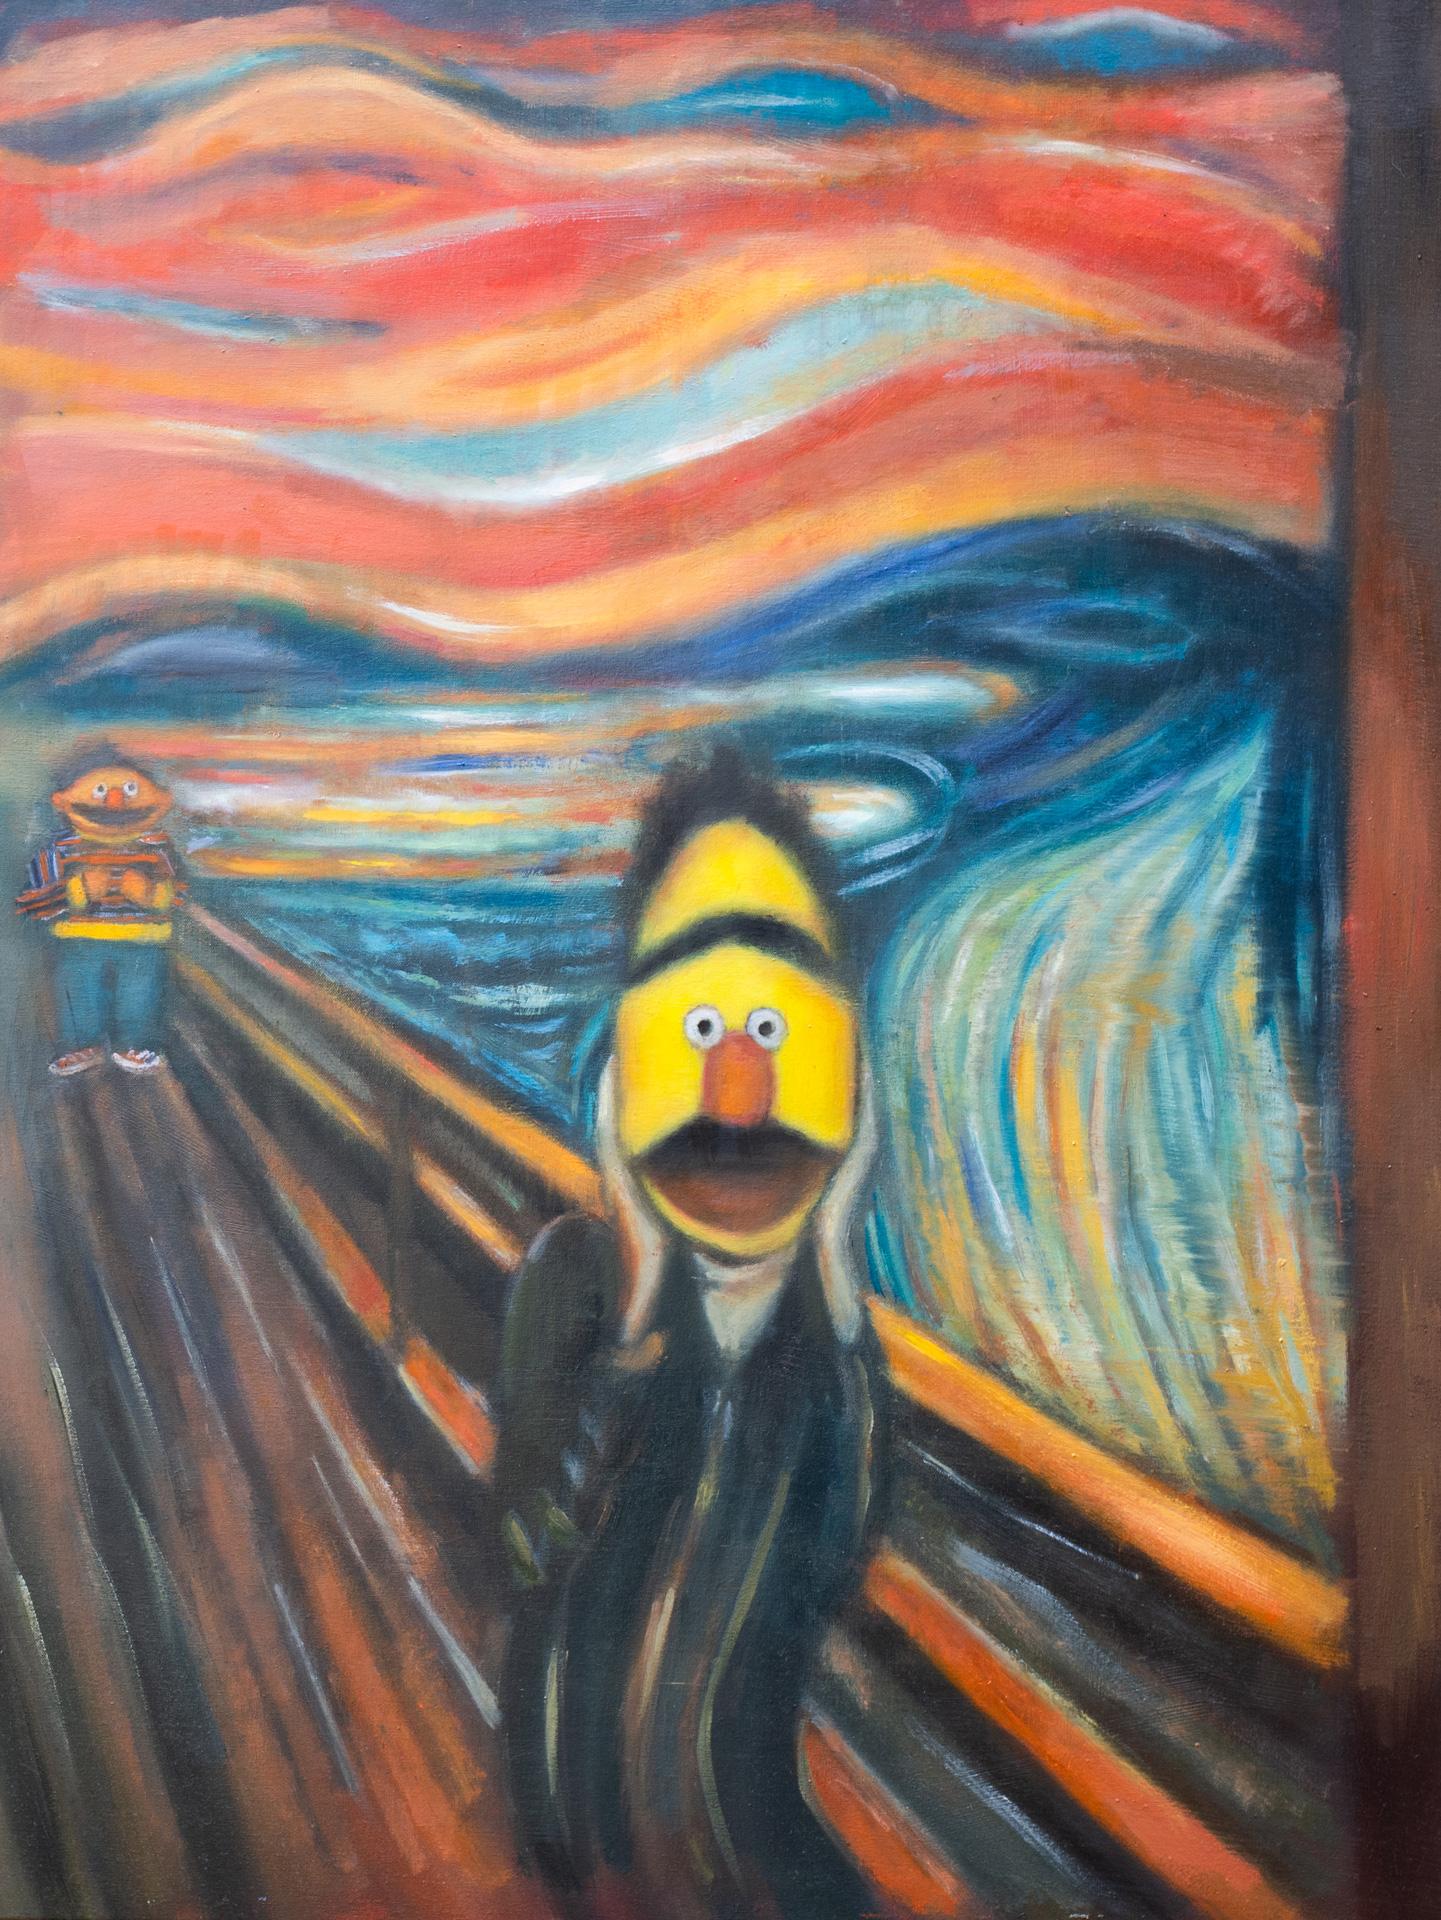 Bert x Ernie Scream